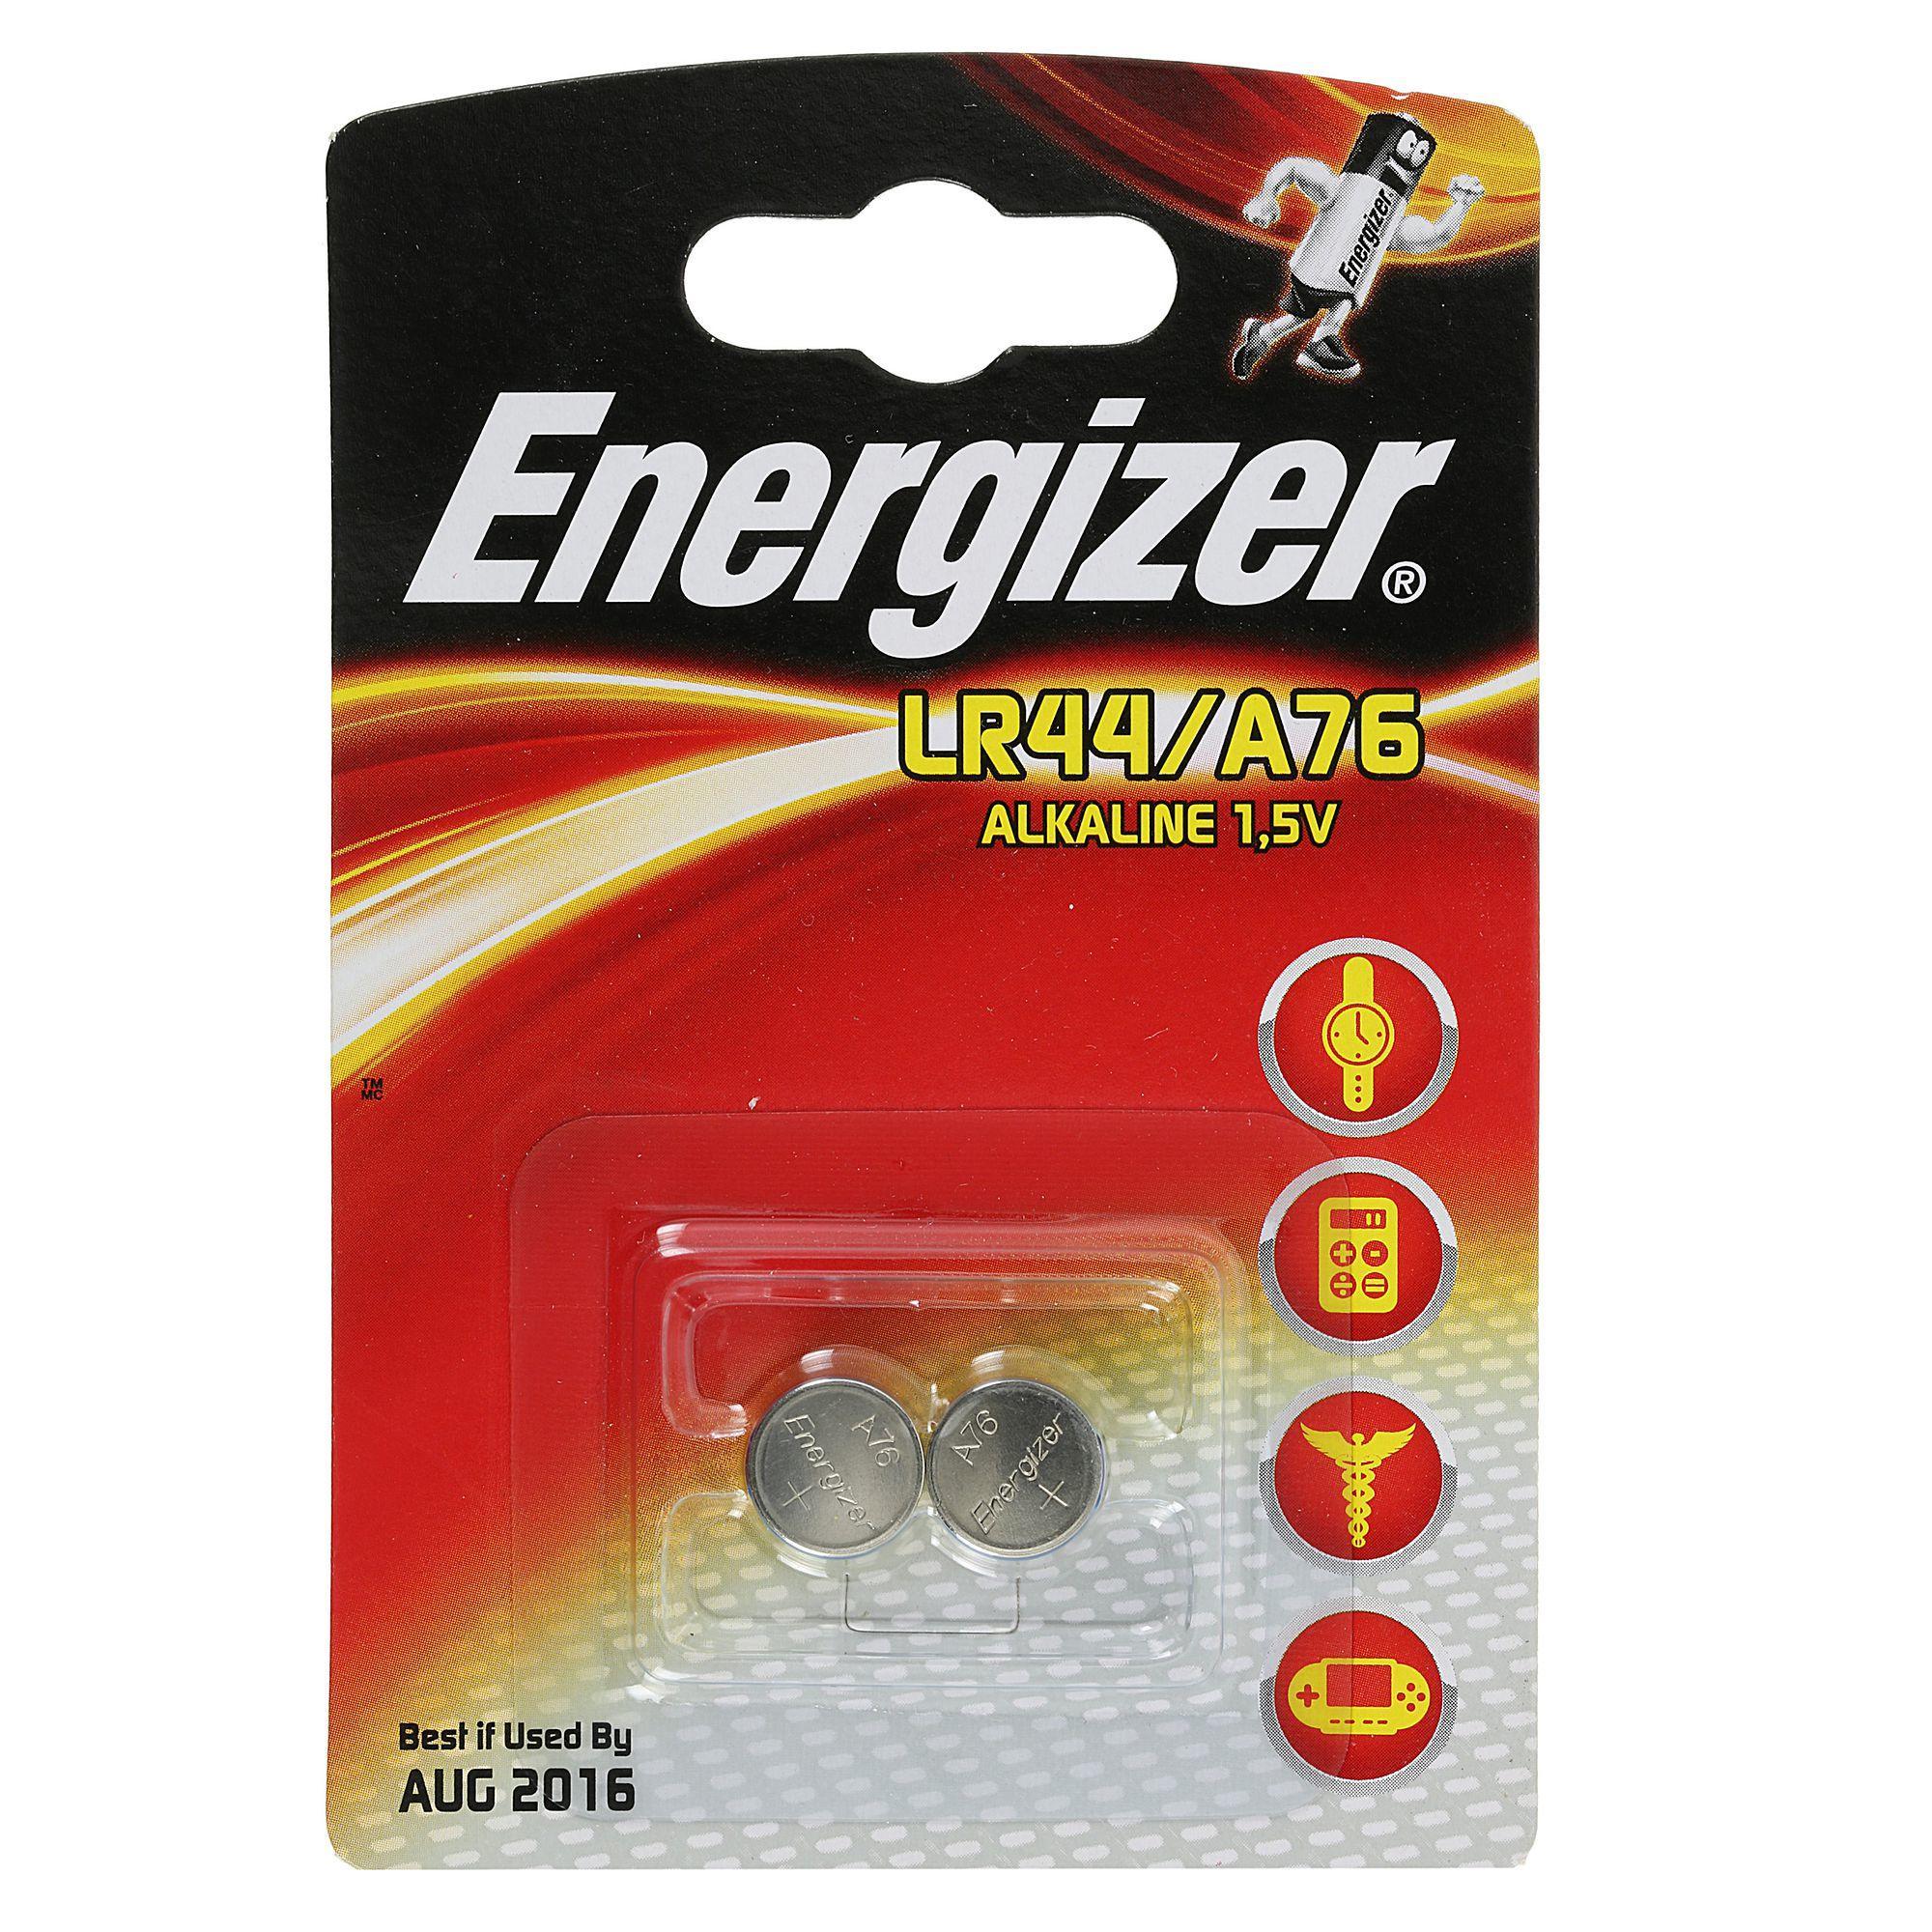 Energizer BATTERIJEN LR44/A76